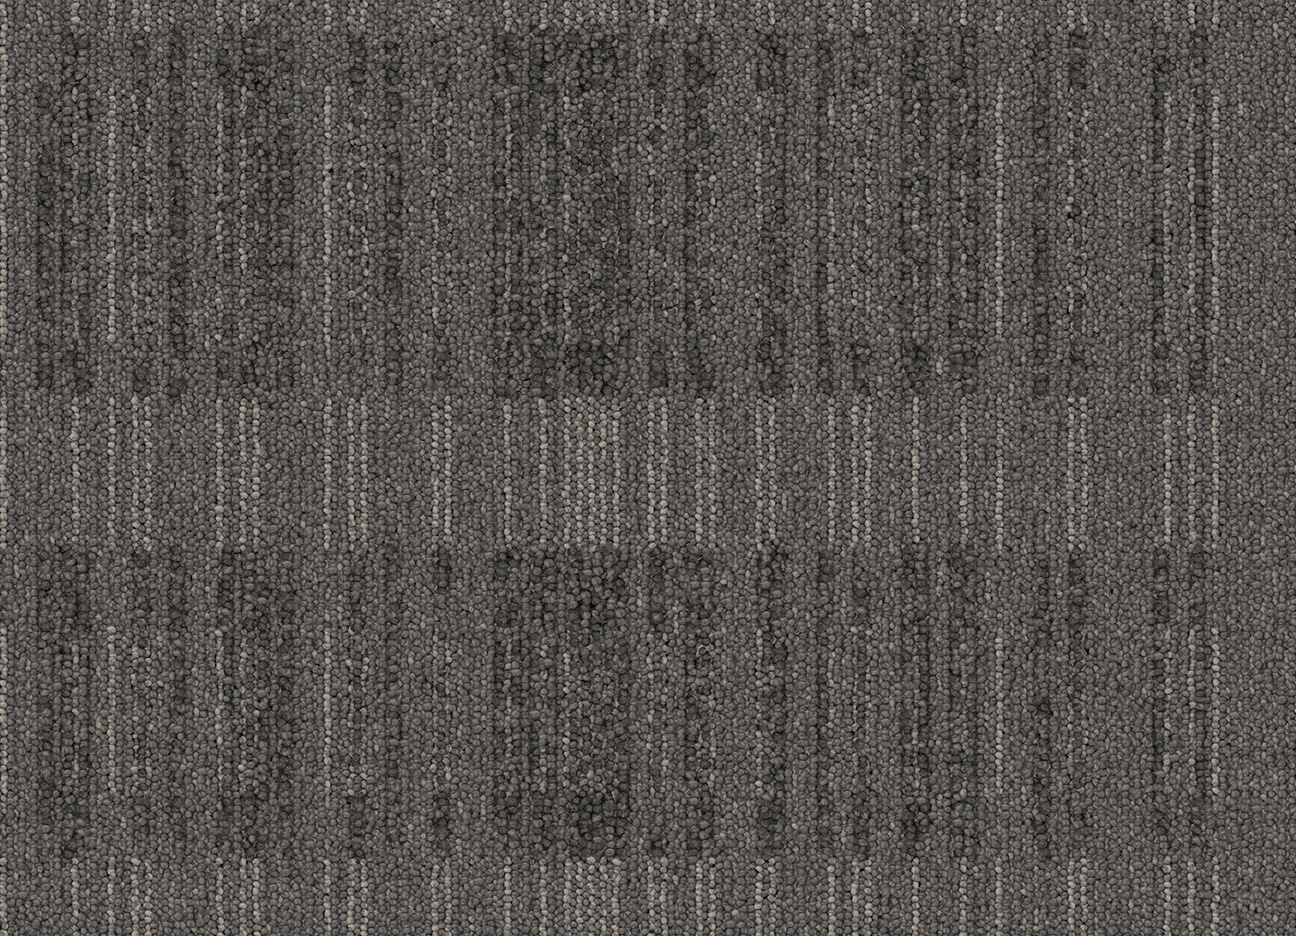 Hidden Gem Dalton Hospitality Carpet